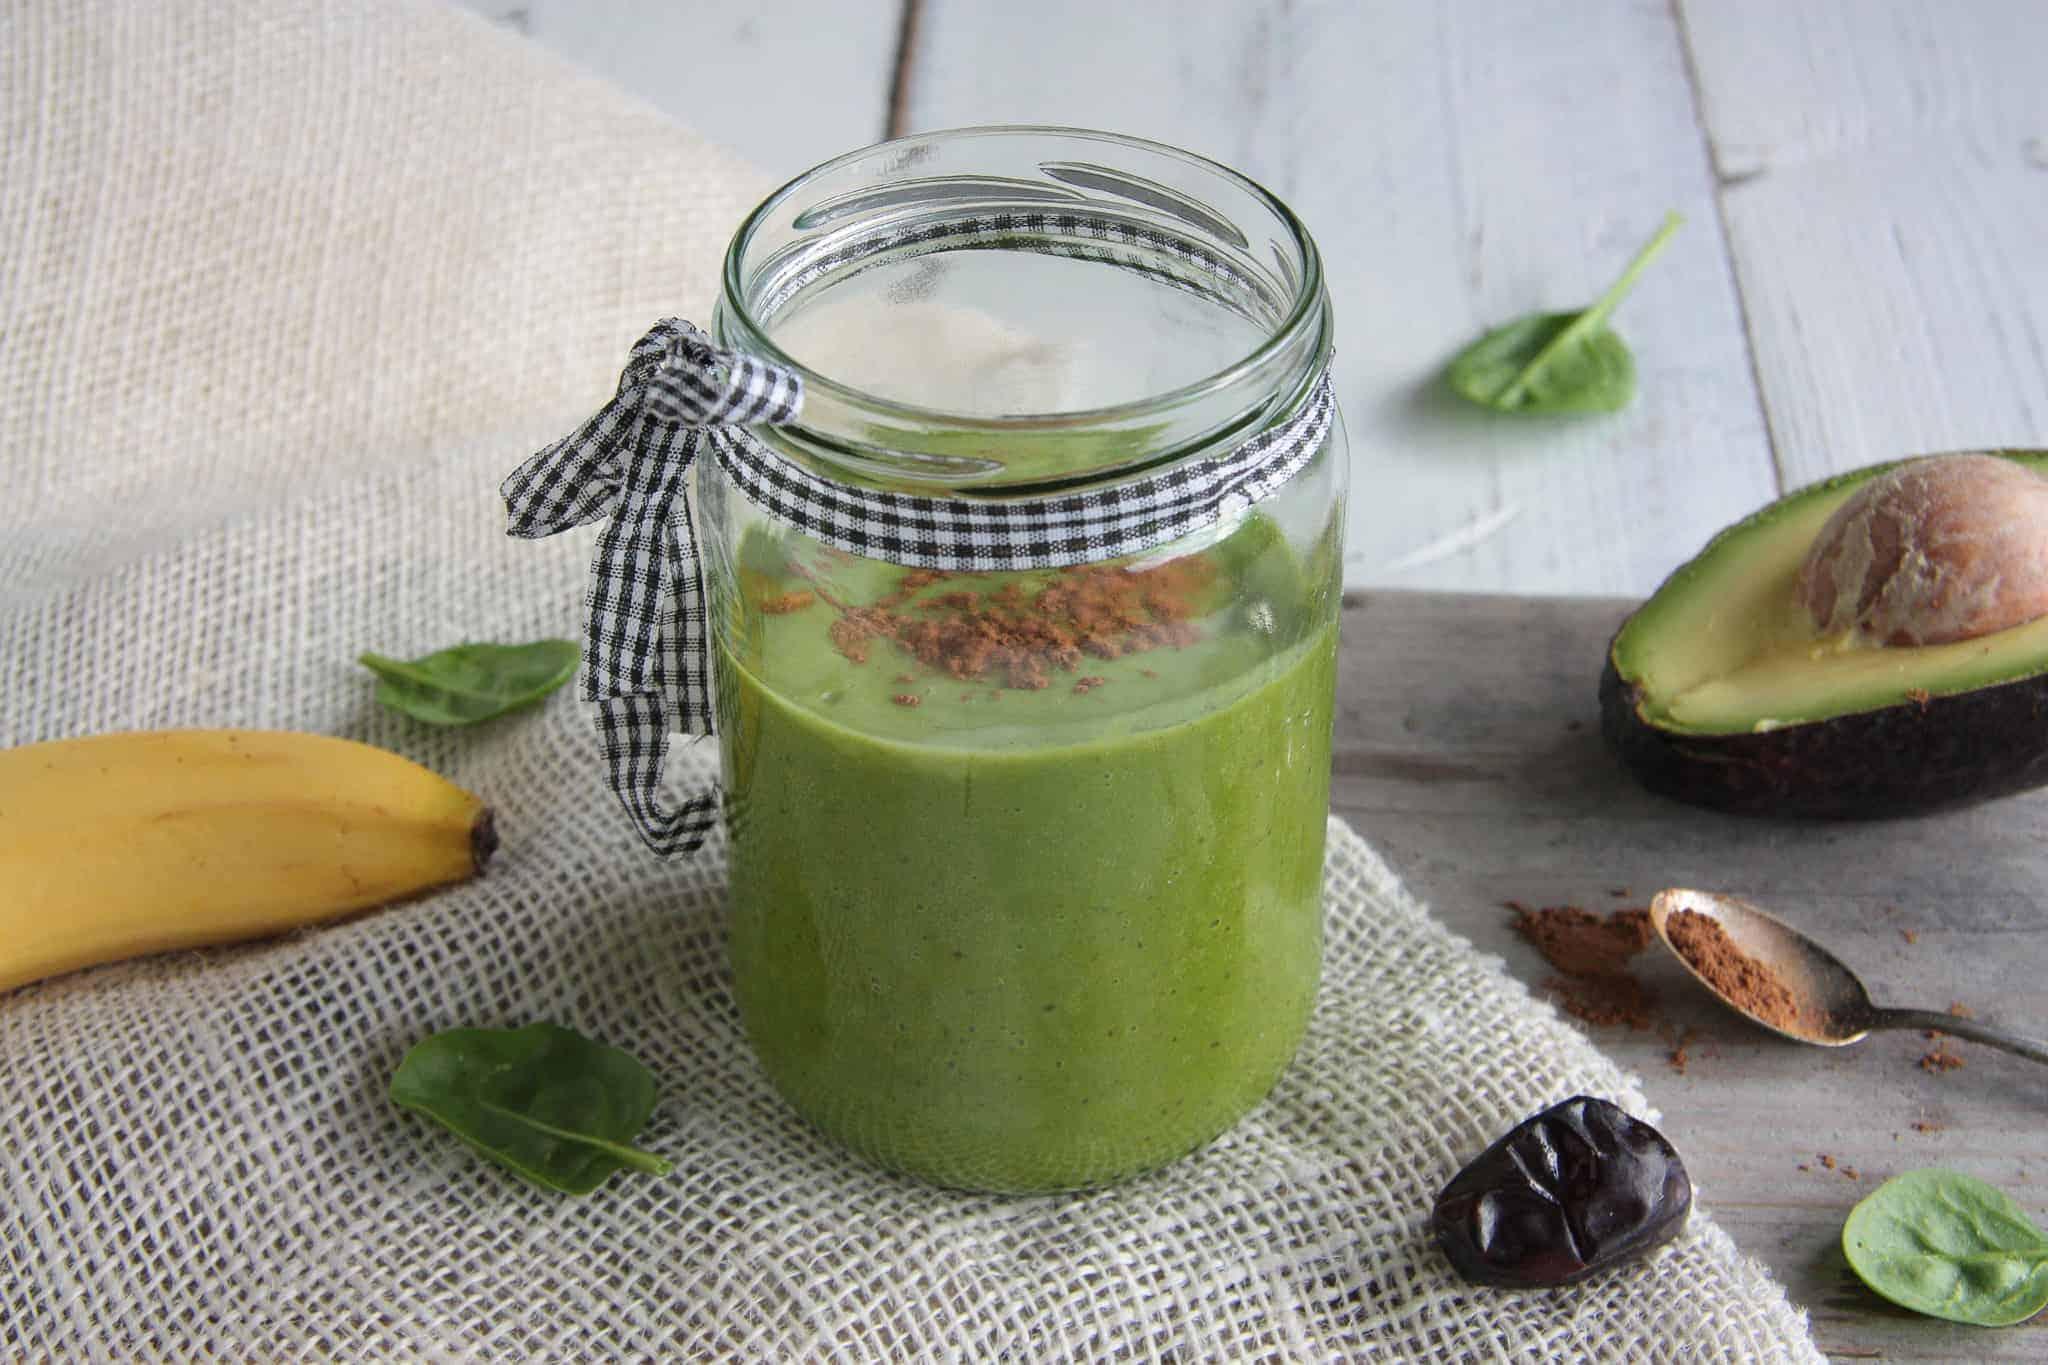 amandelmelk smoothie, groene smoothie, amandelmelk, groen, smoothie